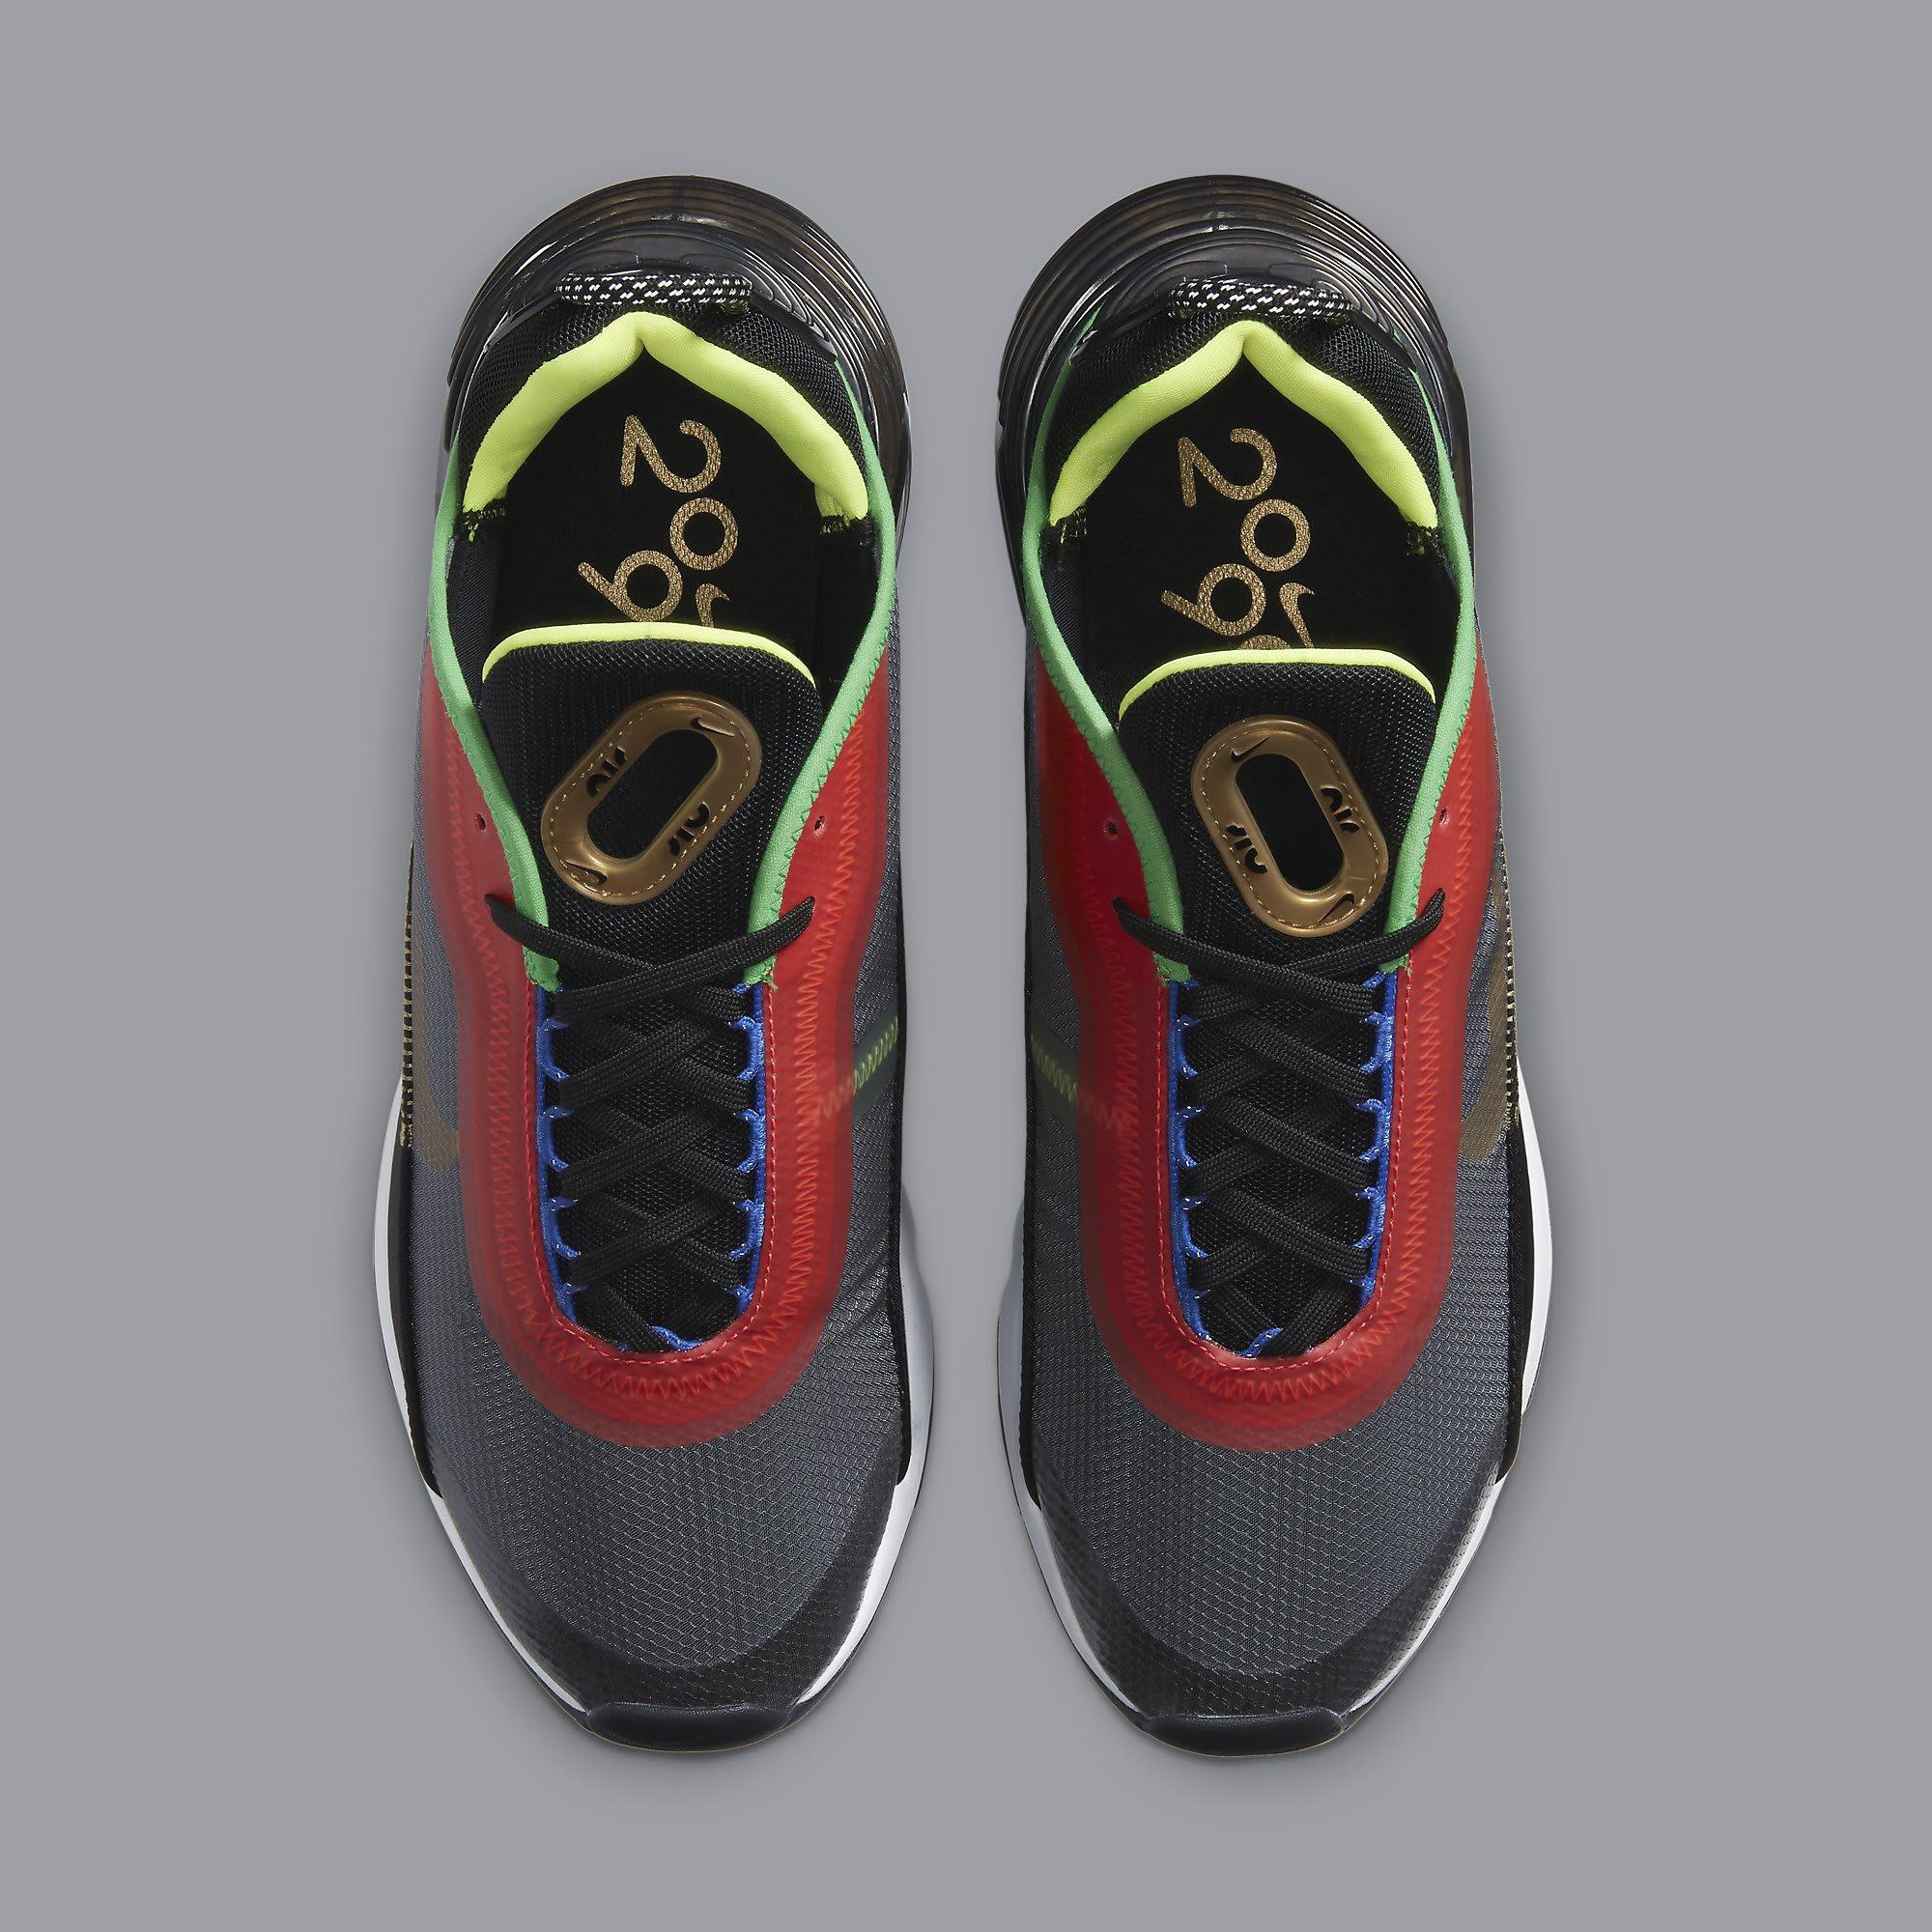 Nike Air Max 2090 'Hidden Message' CZ8698-074 Top